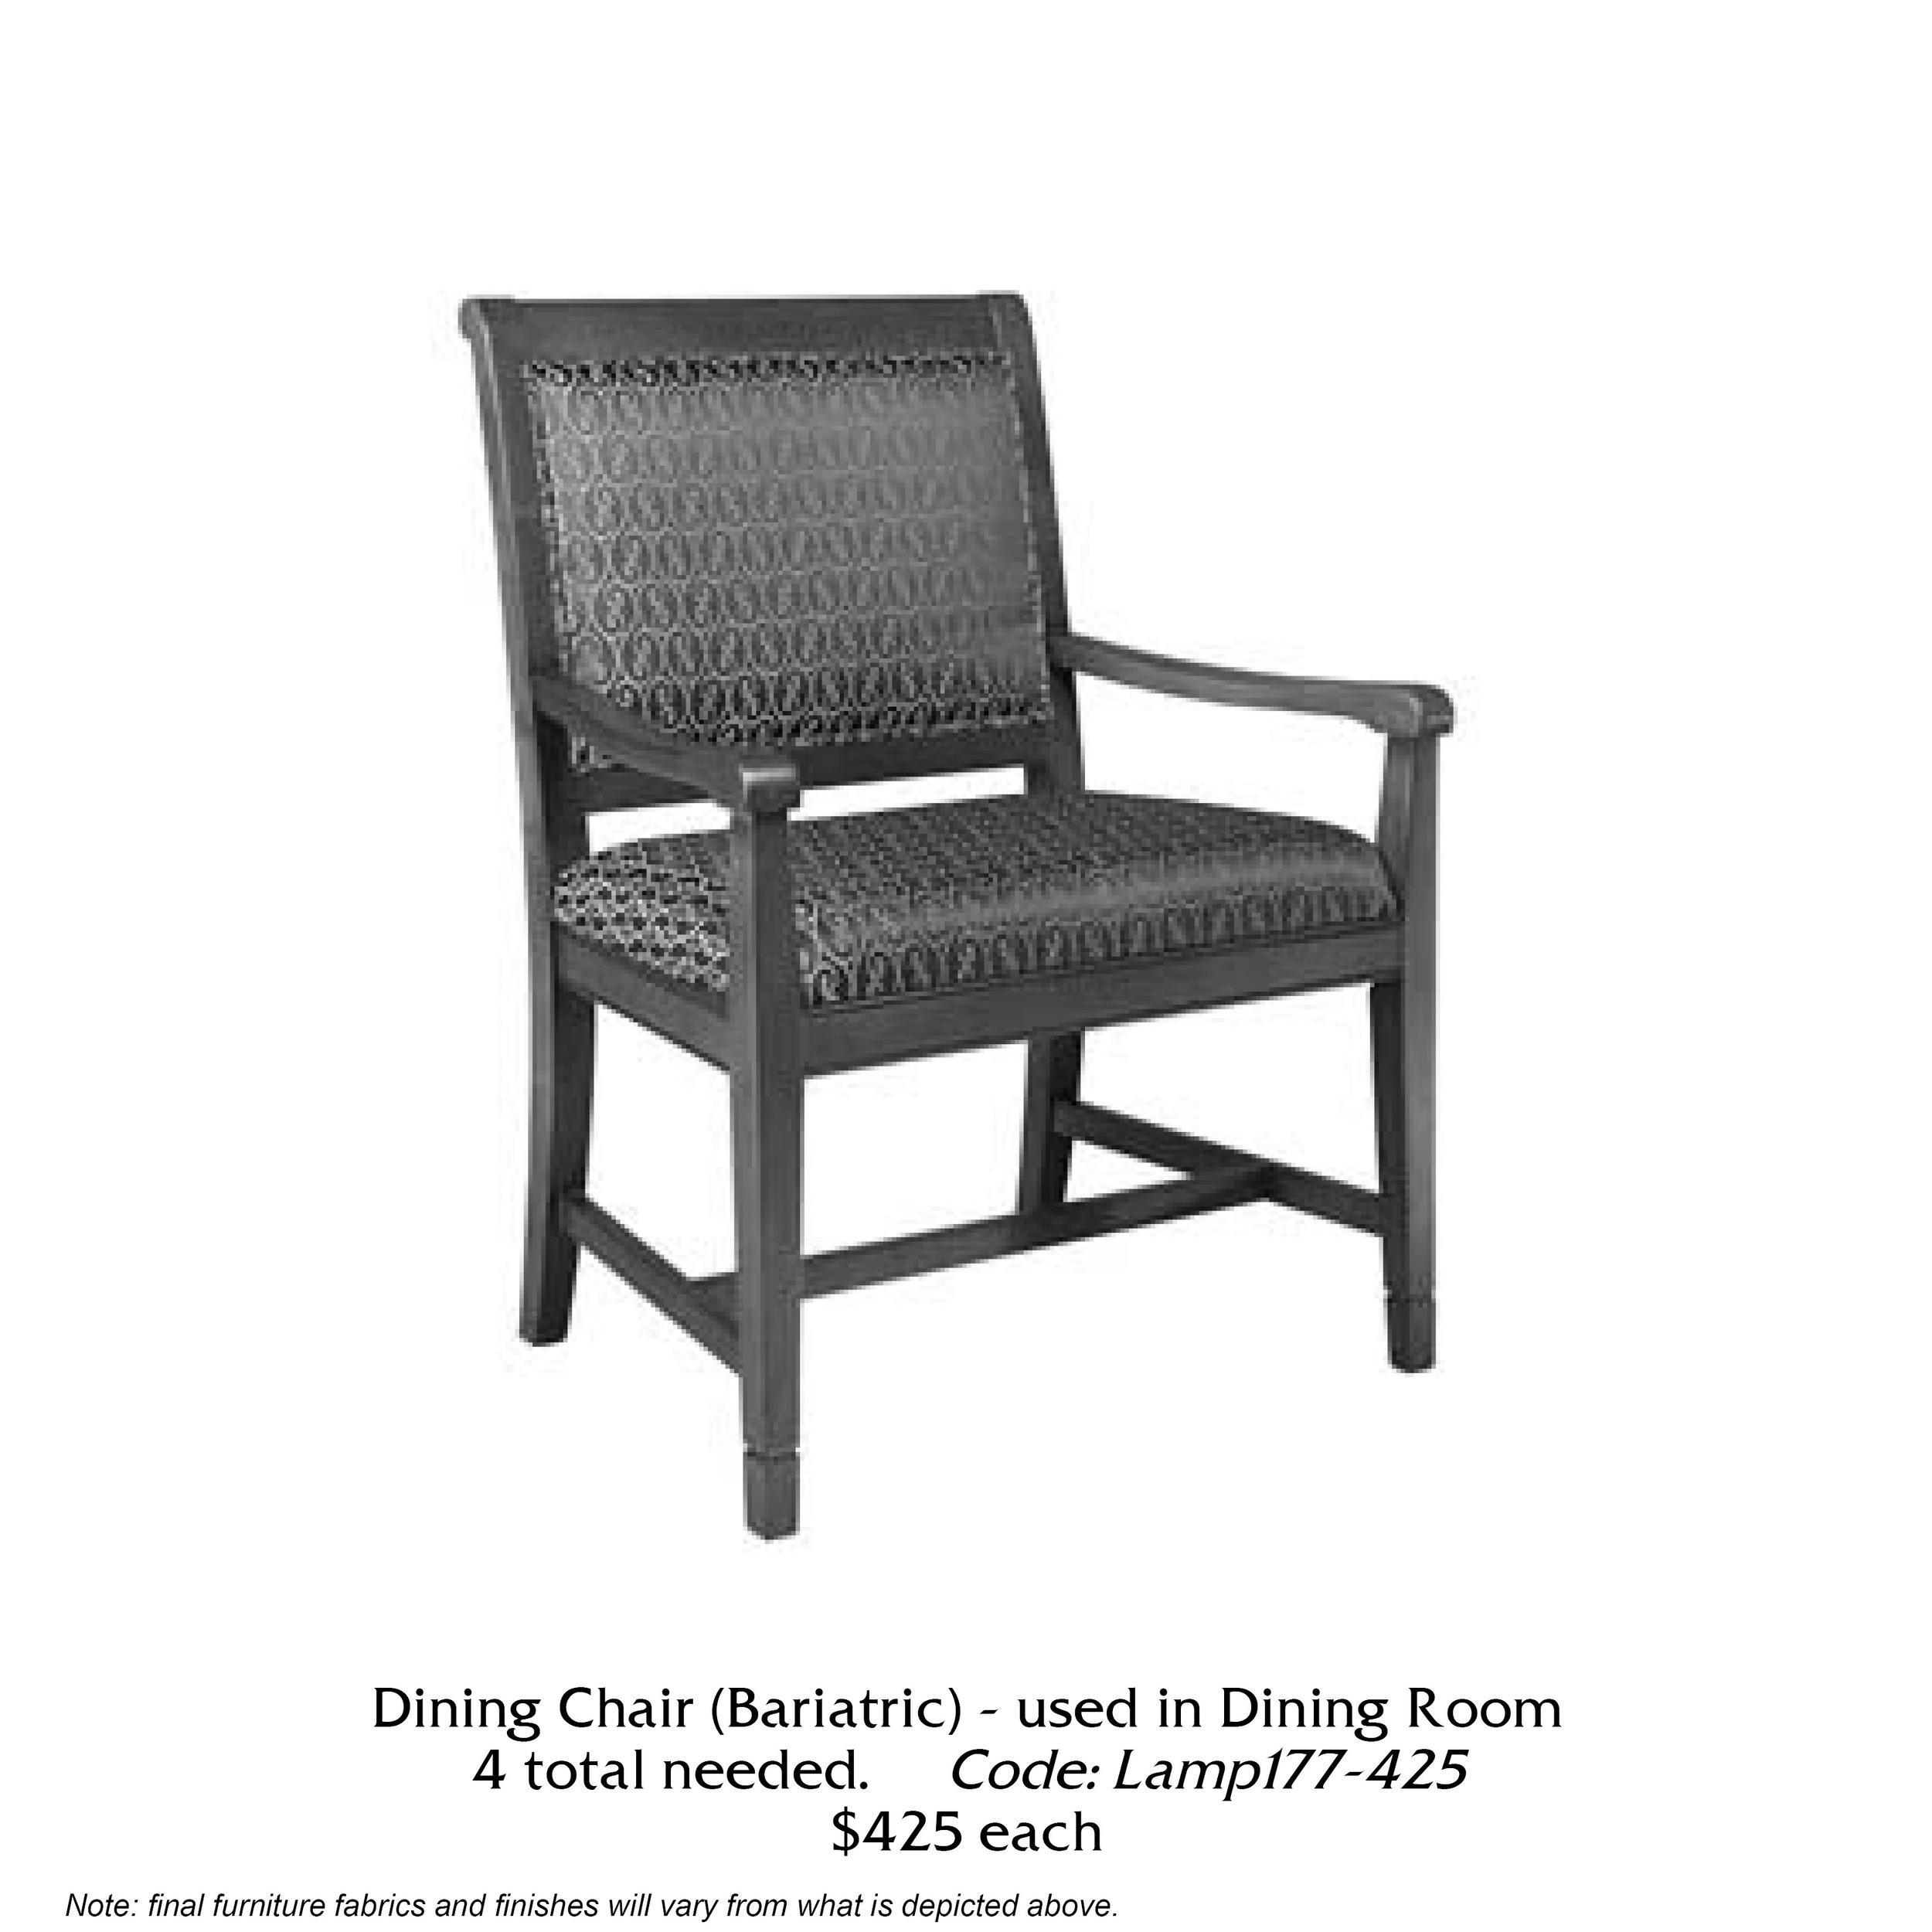 D111-F177-D129-F197-Dining Chair-Bariatric - 2-2.jpg